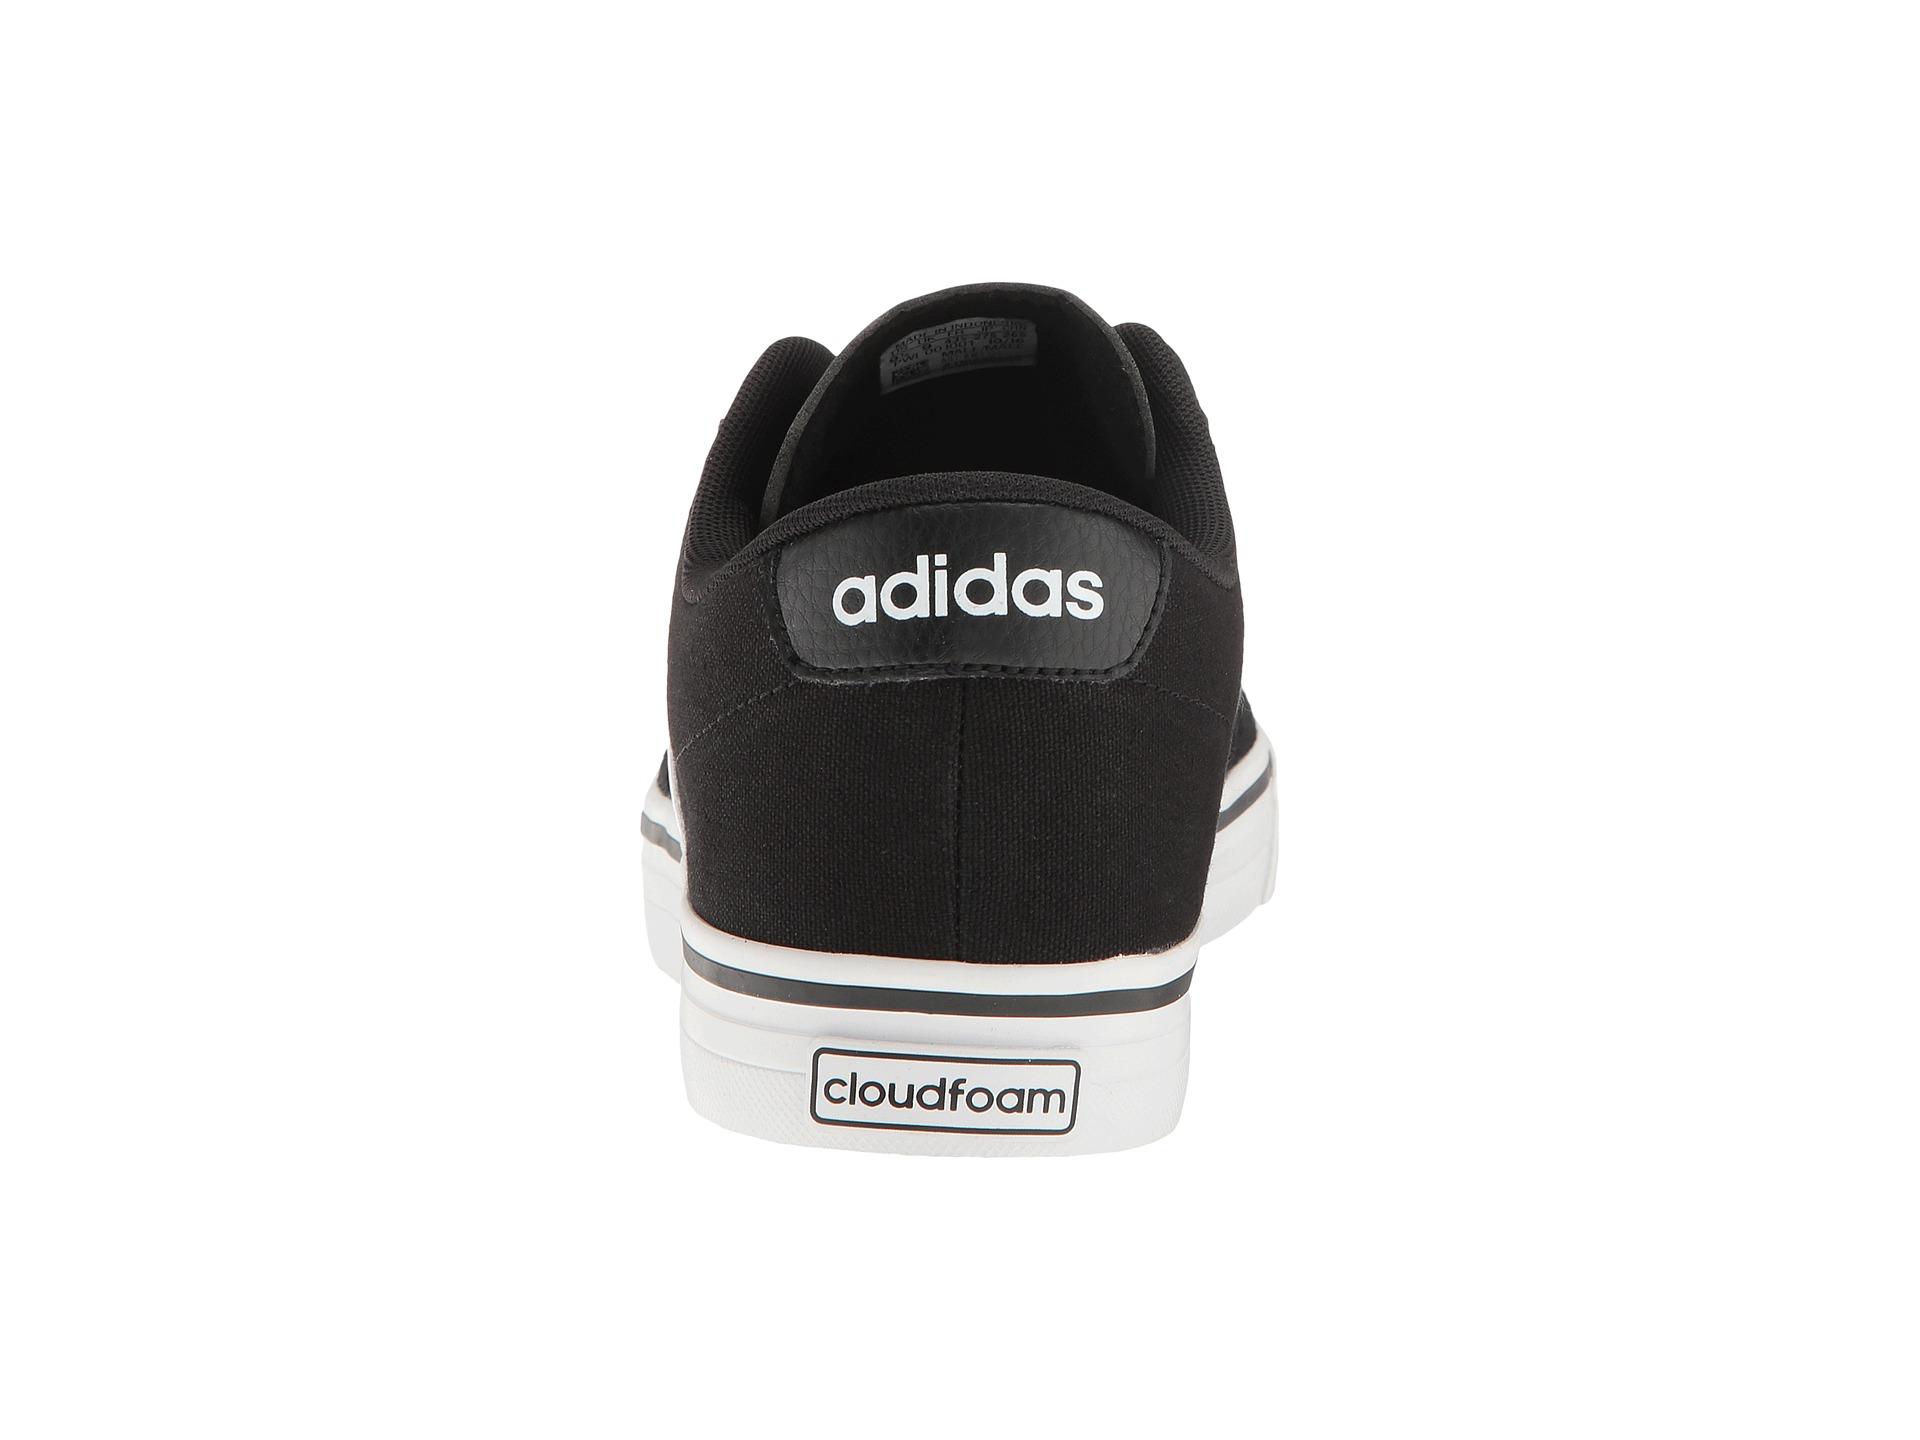 adidas Cloudfoam Super Skate at 6pm.com